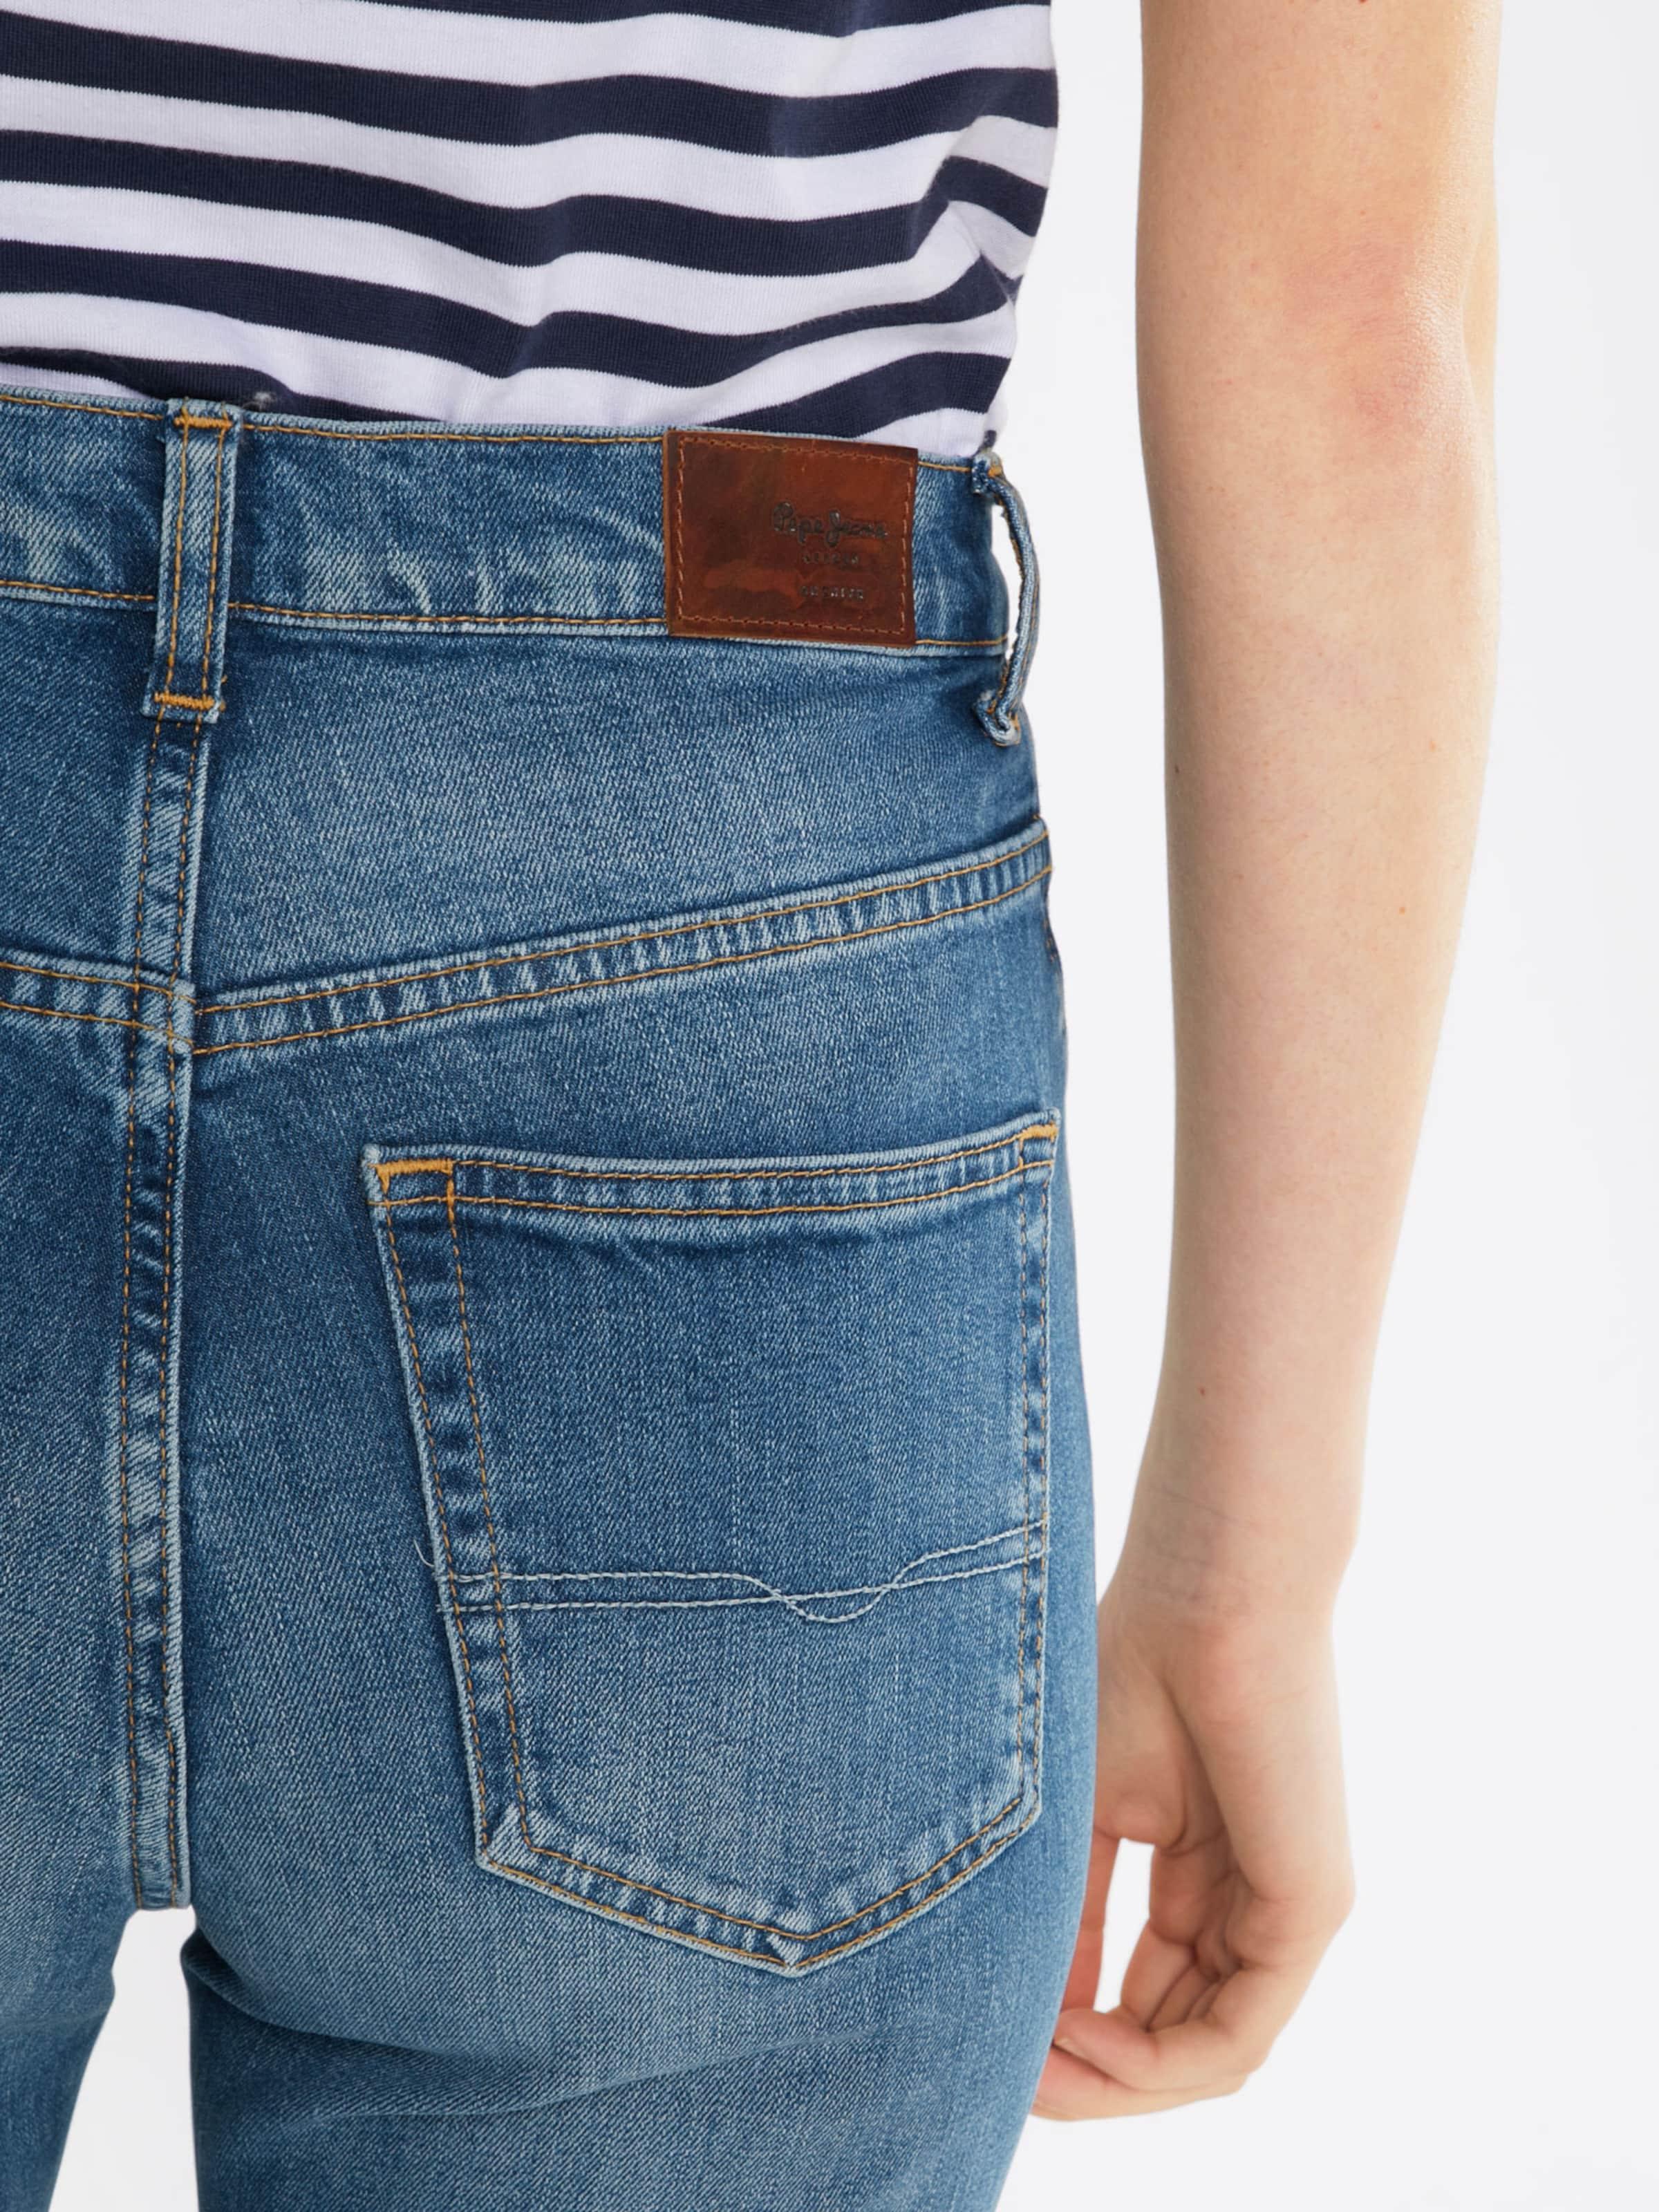 Verkauf Echt Pepe Jeans 'Gladis' Mom-Jeans Bester Verkauf Zum Verkauf Kaufen Online-Verkauf Zuverlässig K1hewO